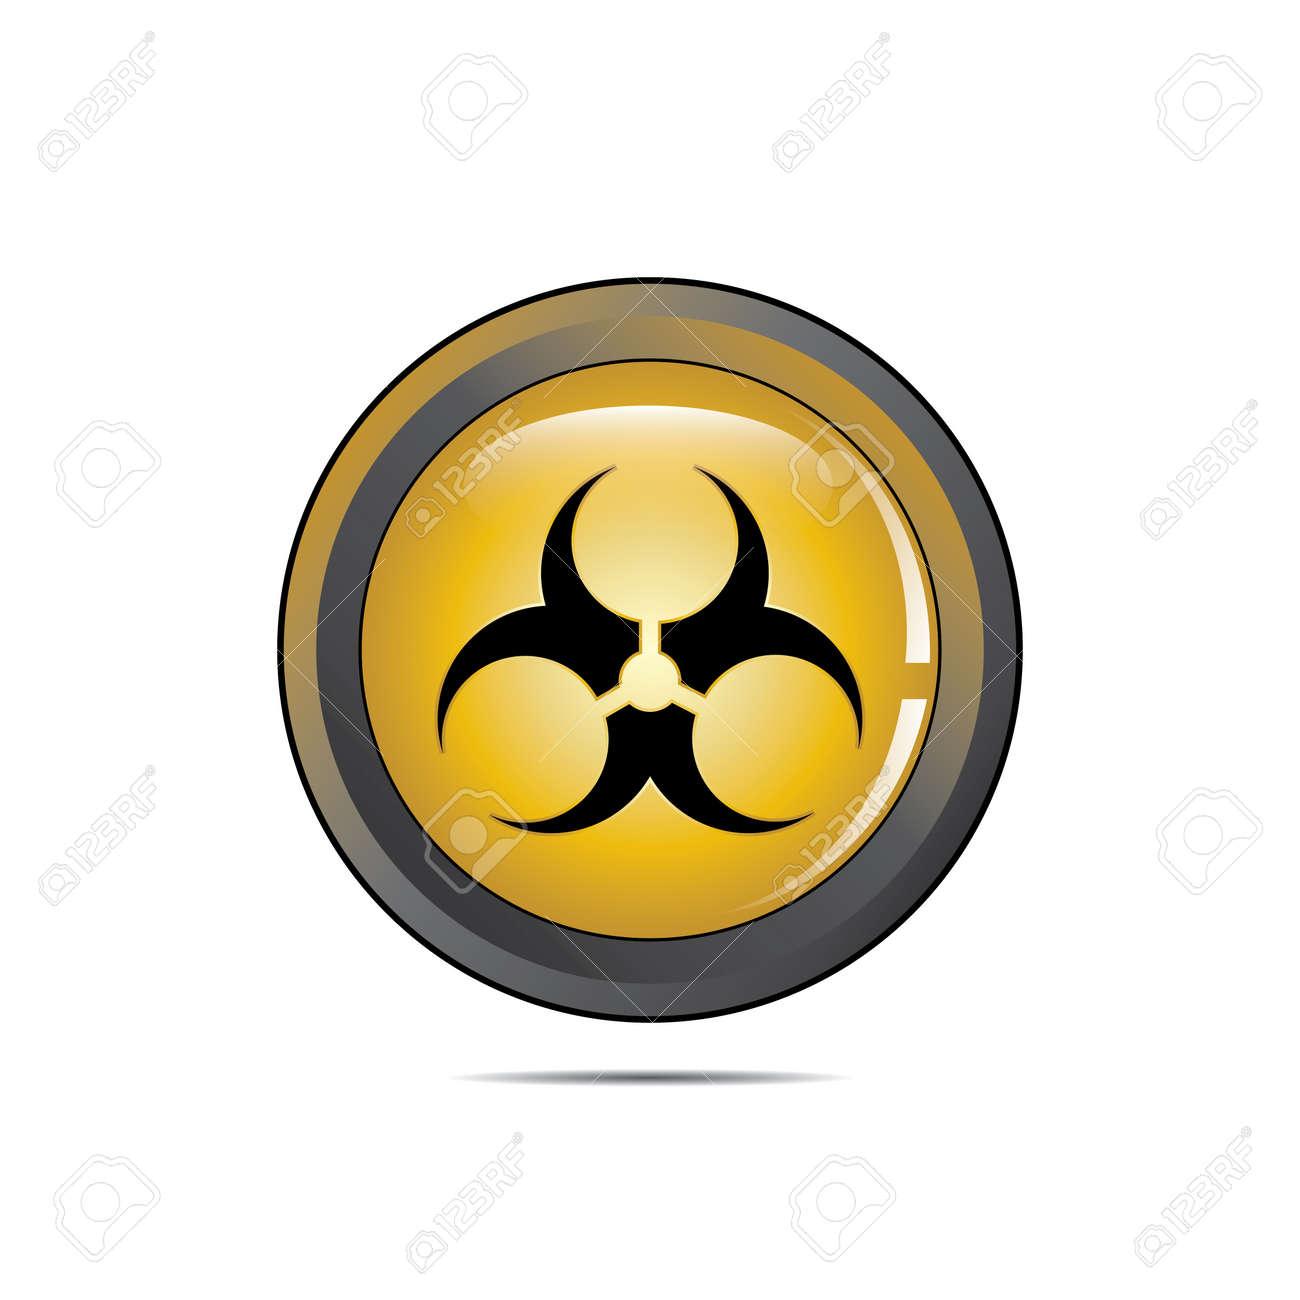 Vector - Radioactive Danger Yellow Button  Caution Radiation Stock Vector - 15541476